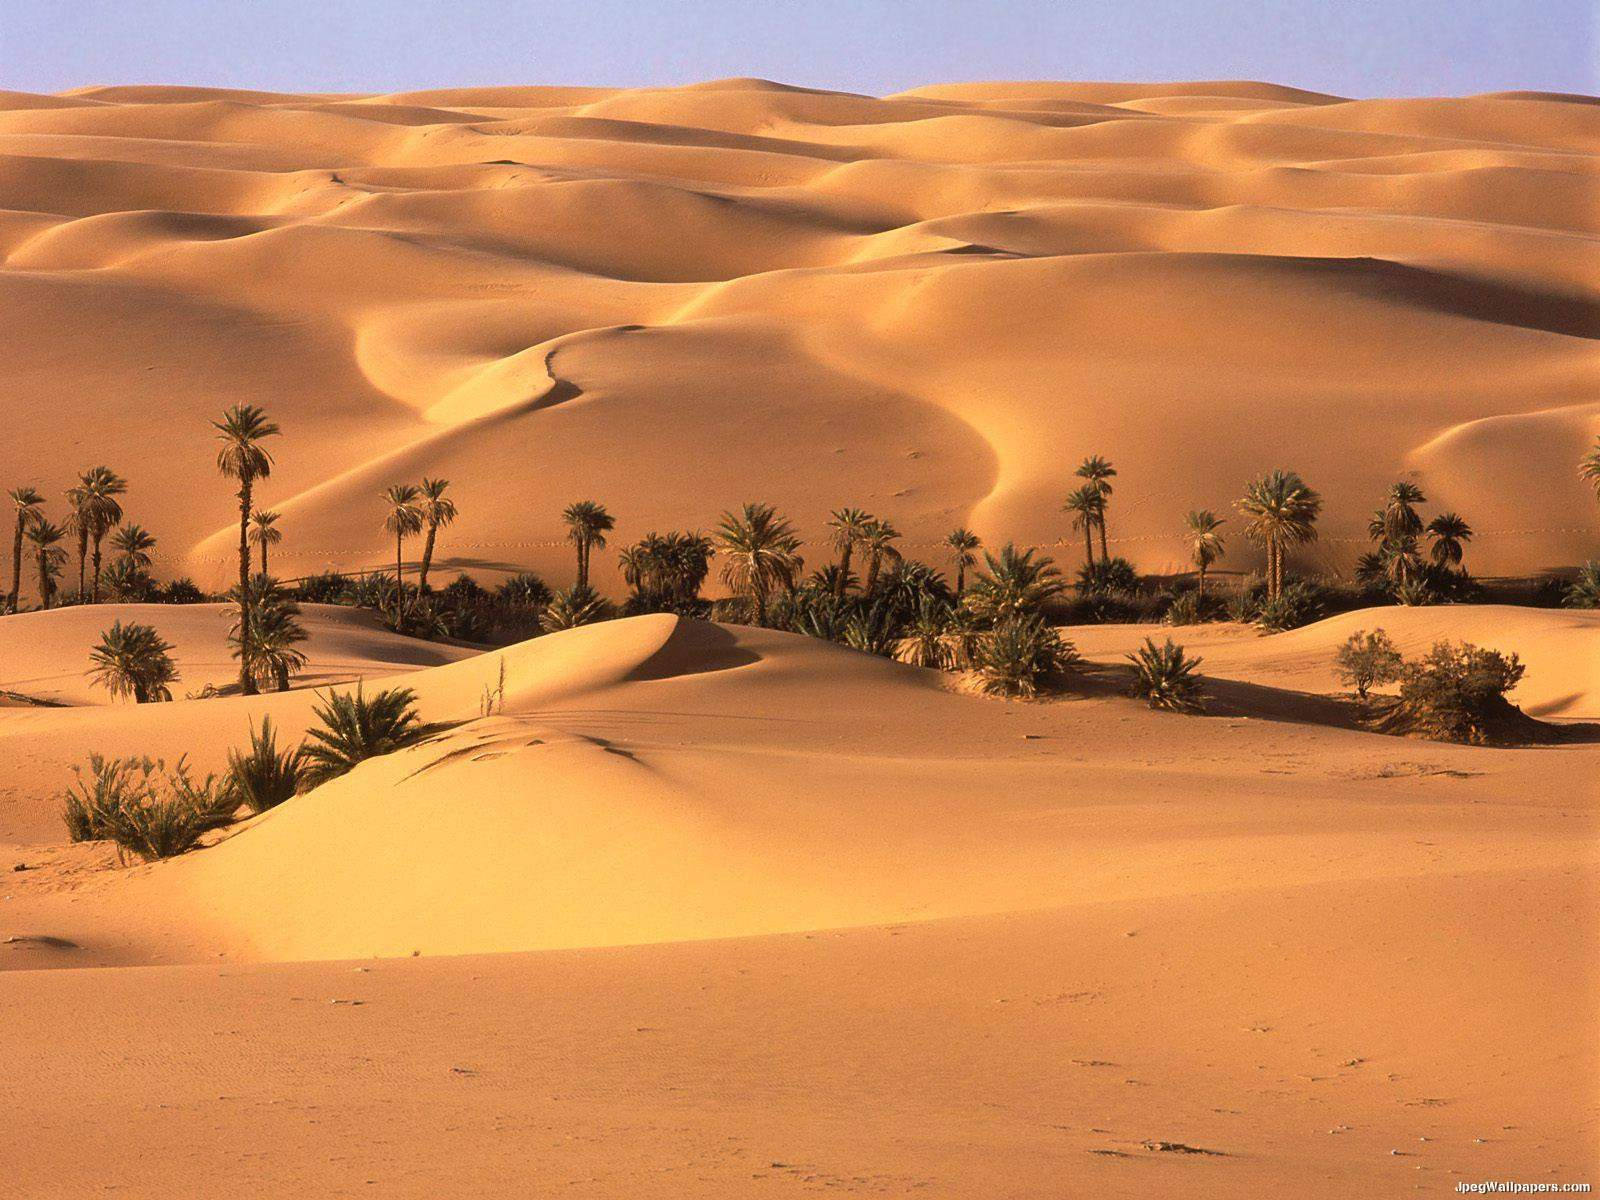 http://www.jpegwallpapers.com/images/wallpapers/Desert-Oasis-Libya-125507.jpeg